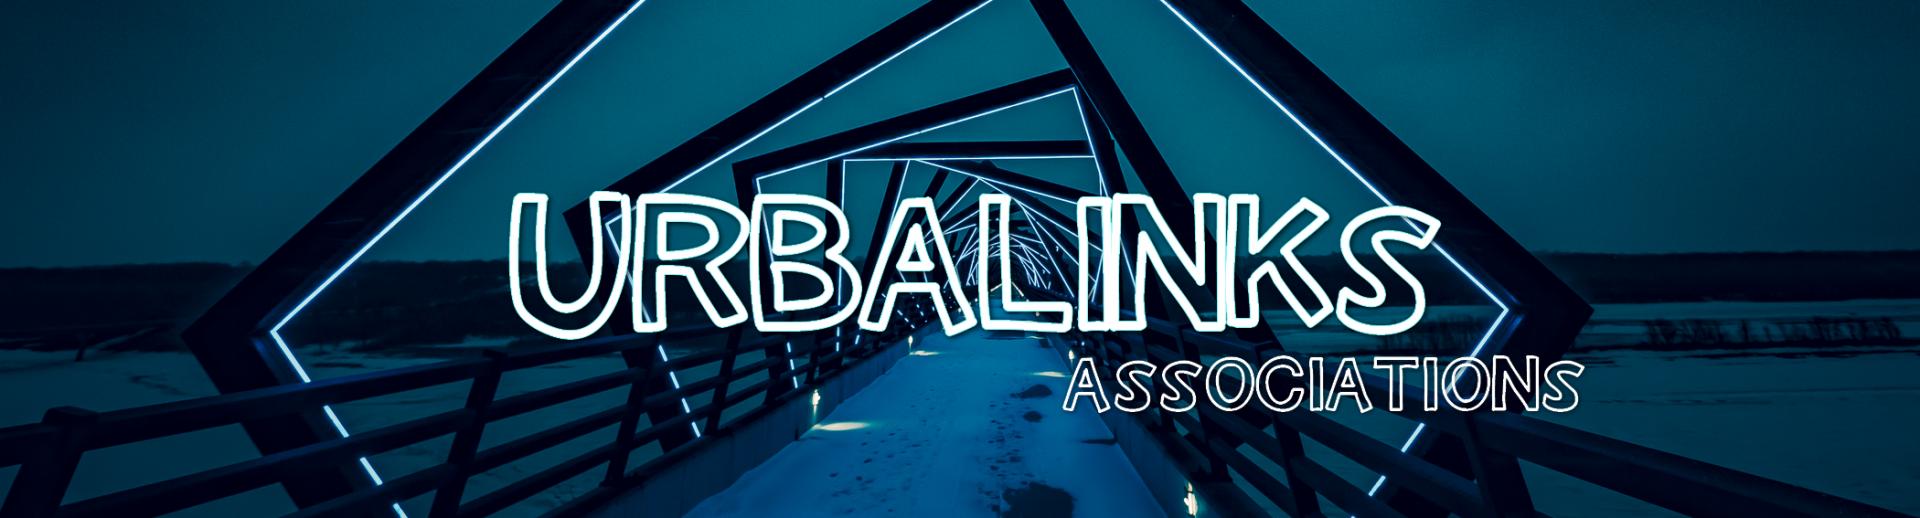 Urbalinks | Associations | UK